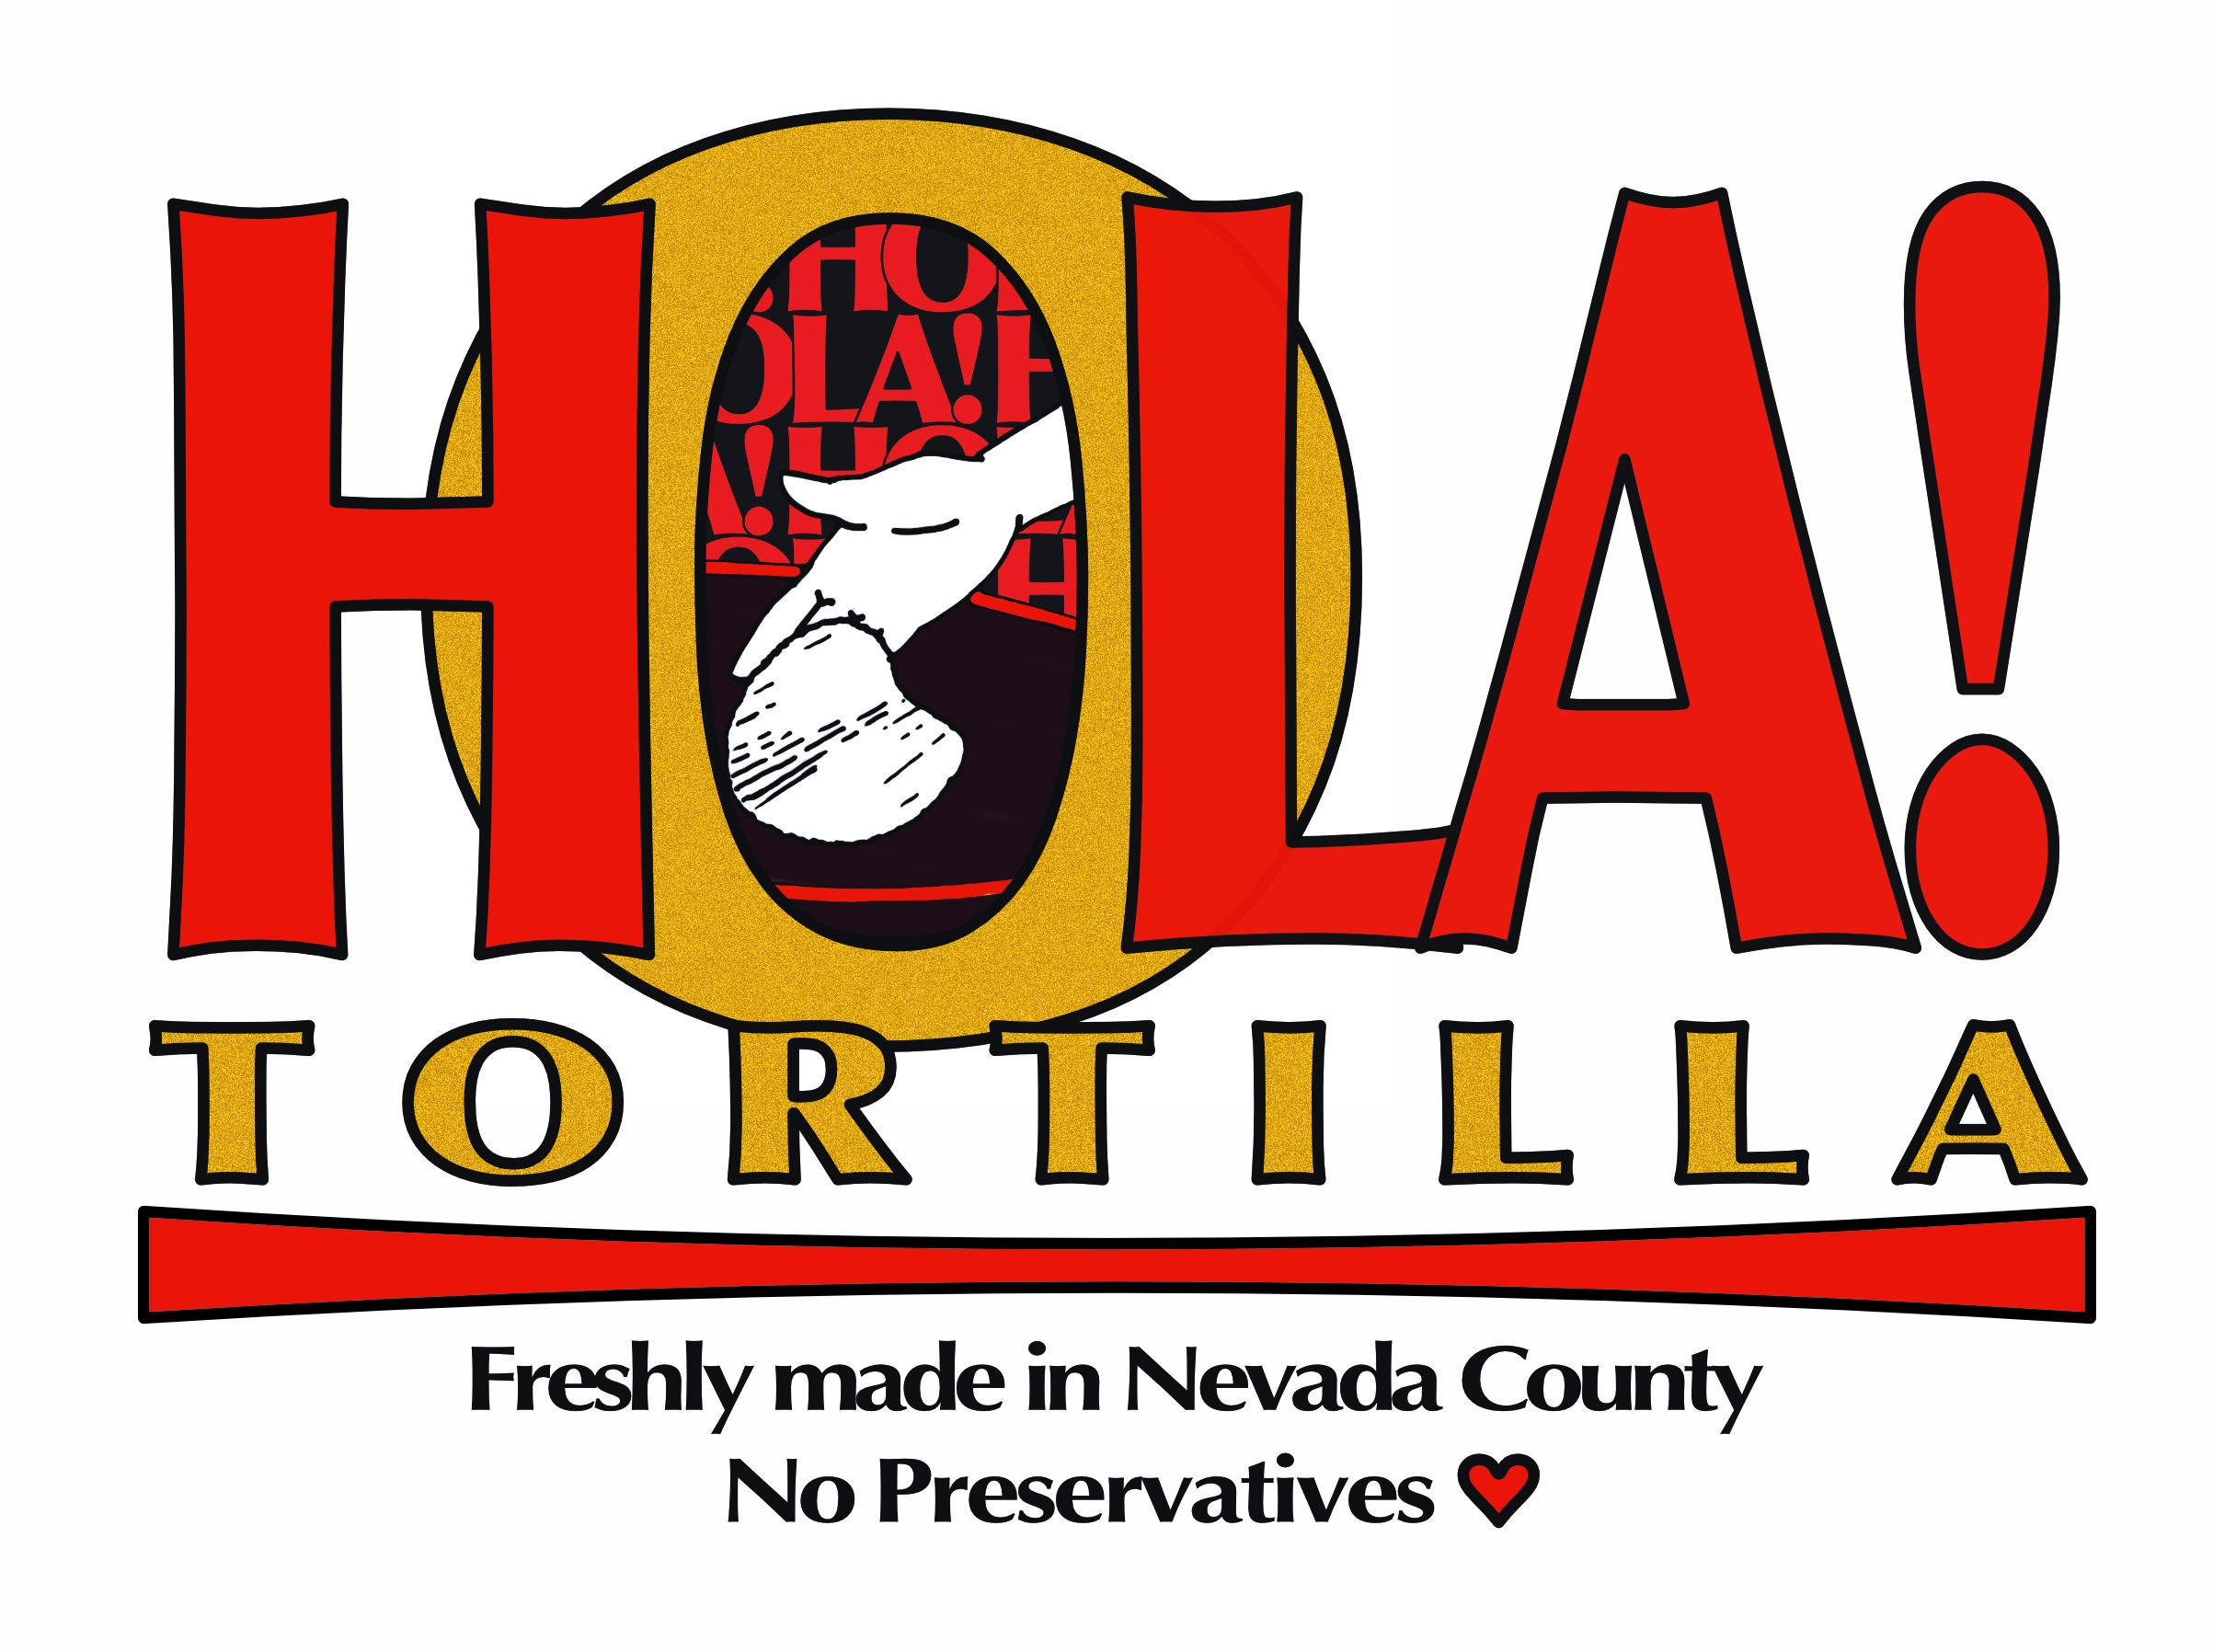 Hola! Tortilla LLC